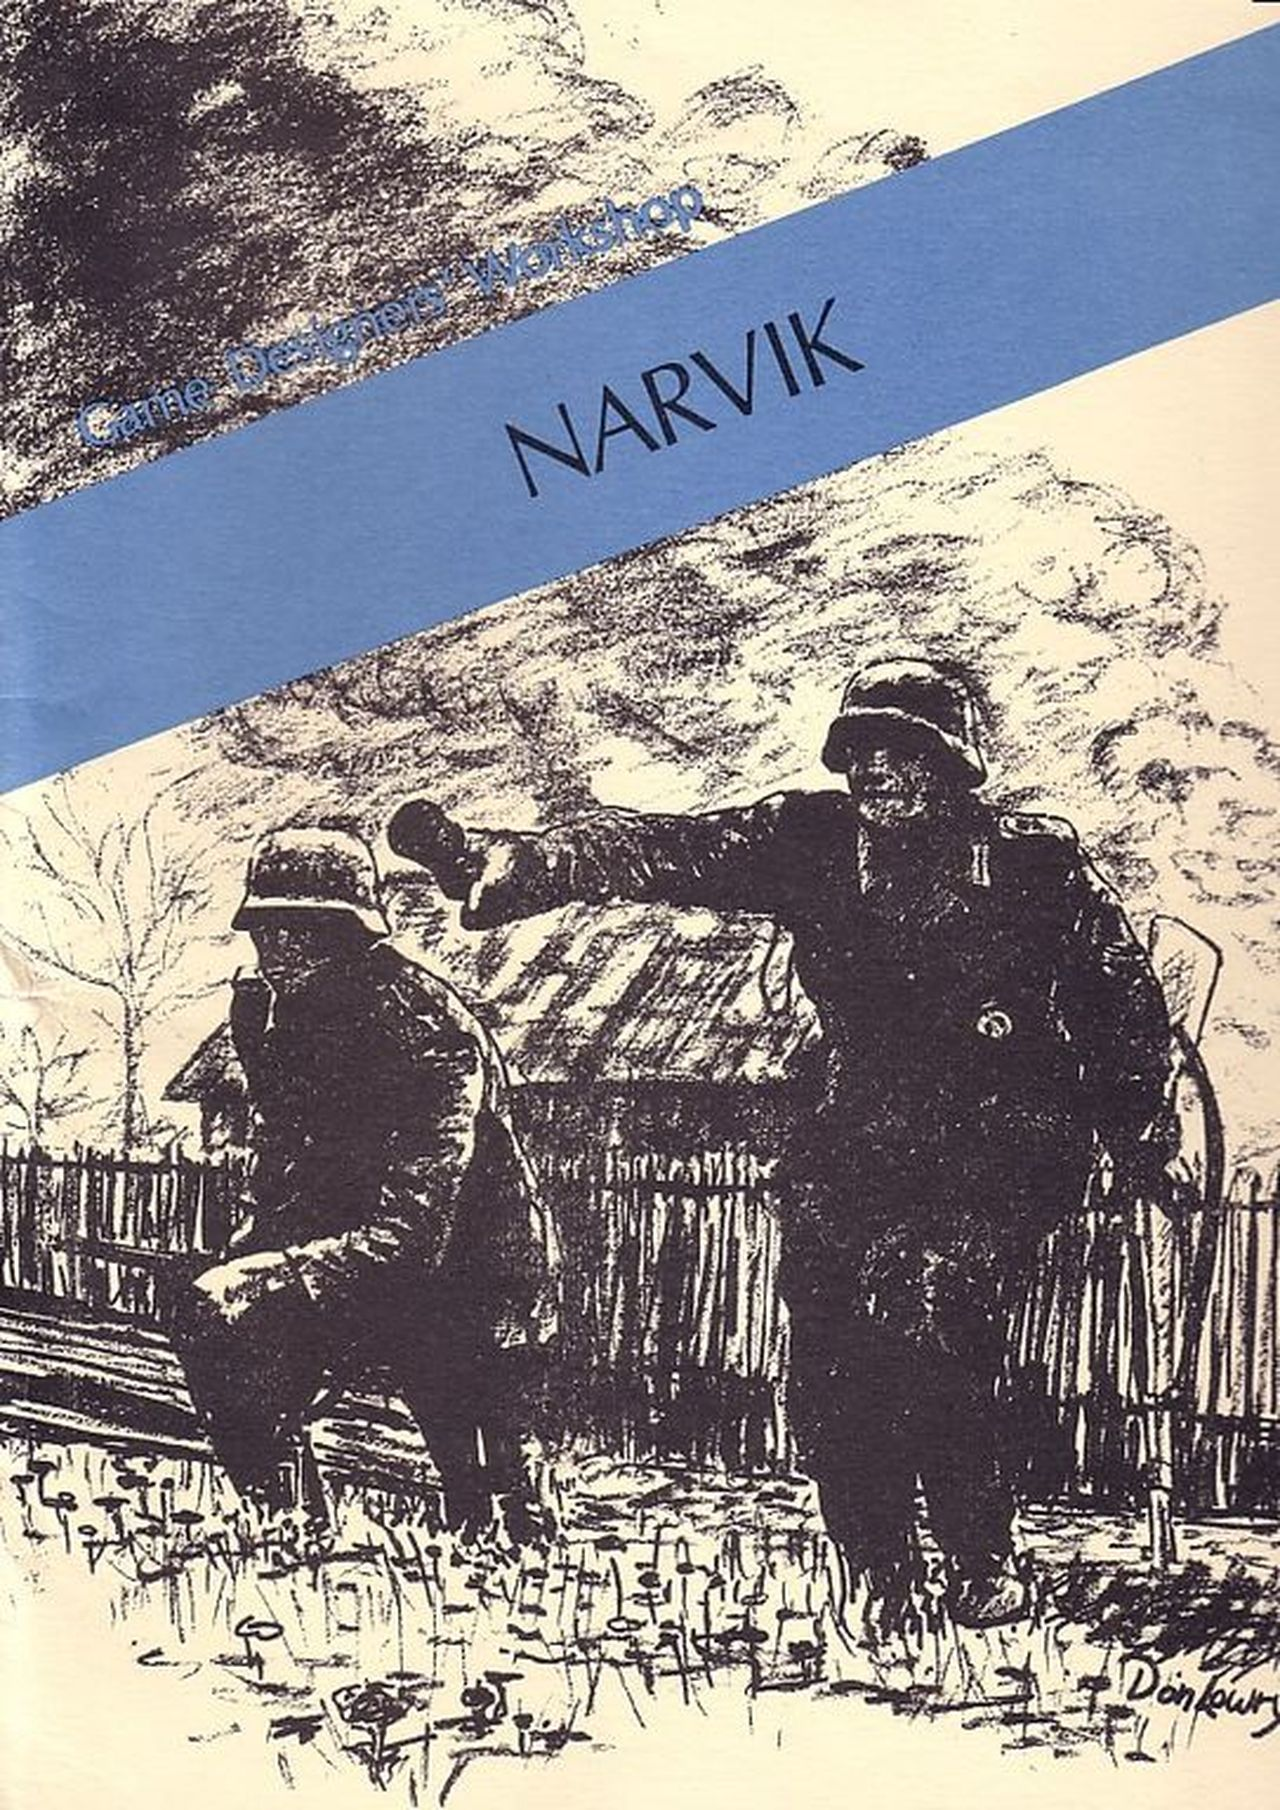 Narvik - Box Art (front)